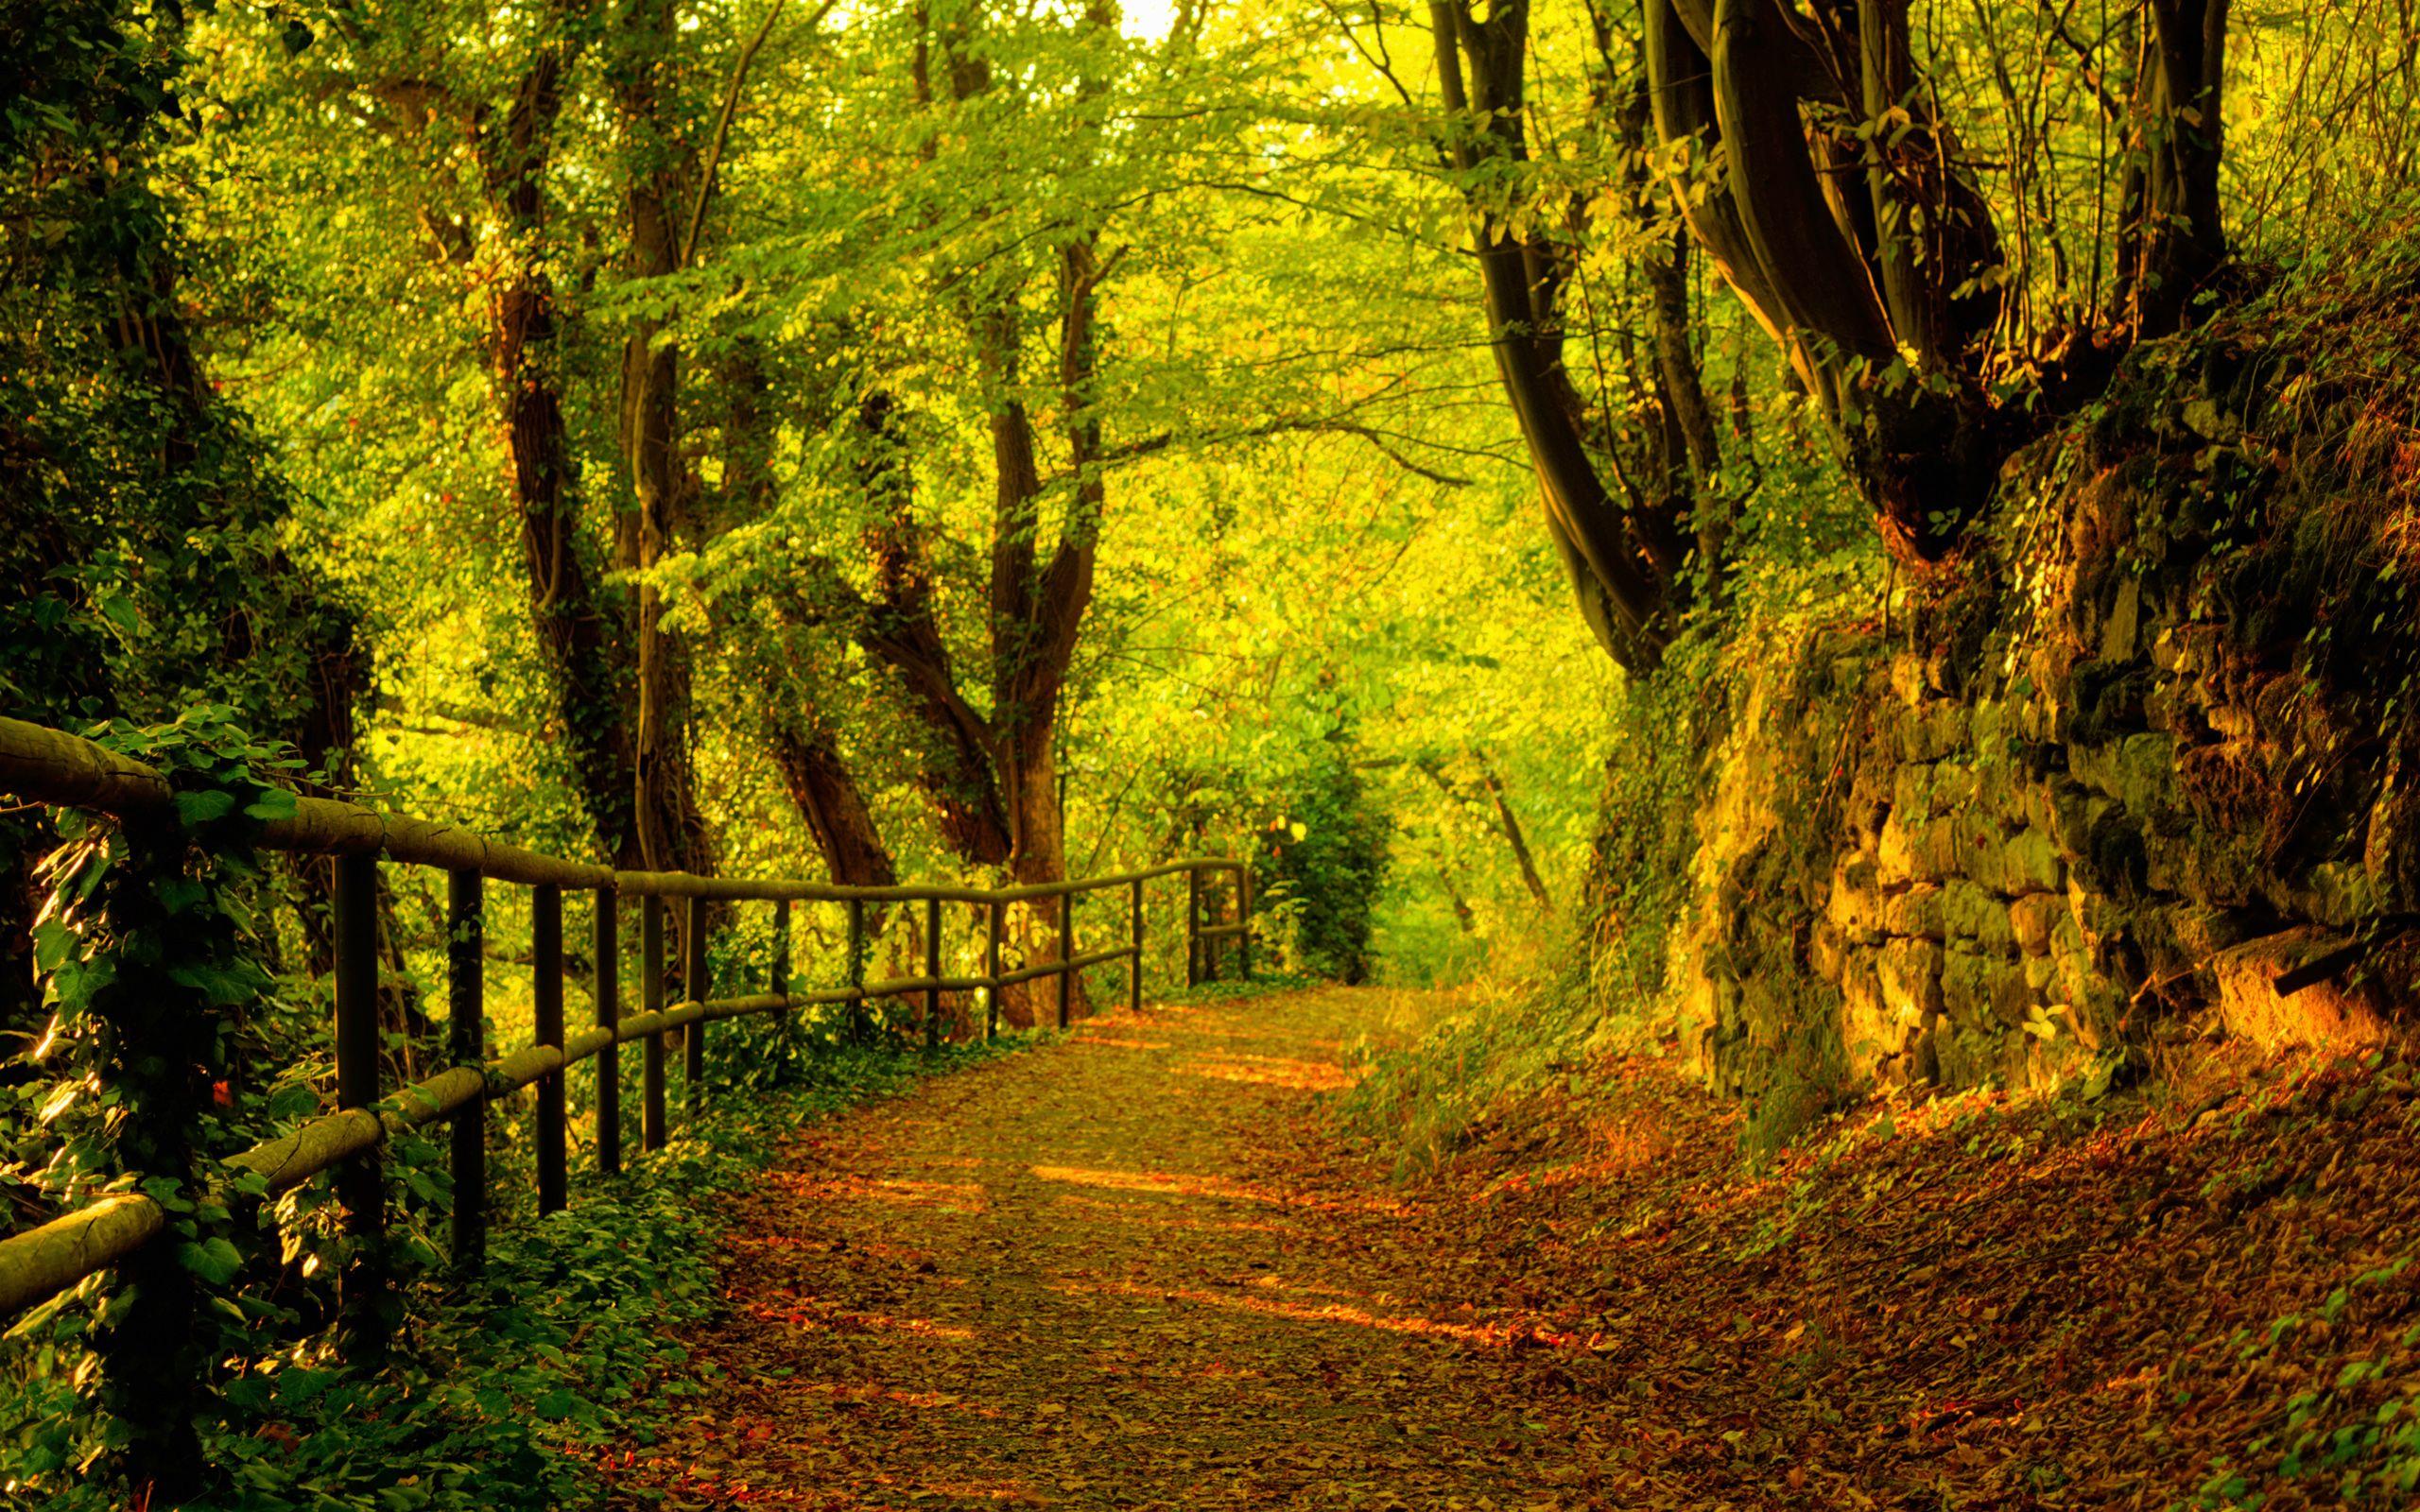 Nature Wallpaper Image September Autumn